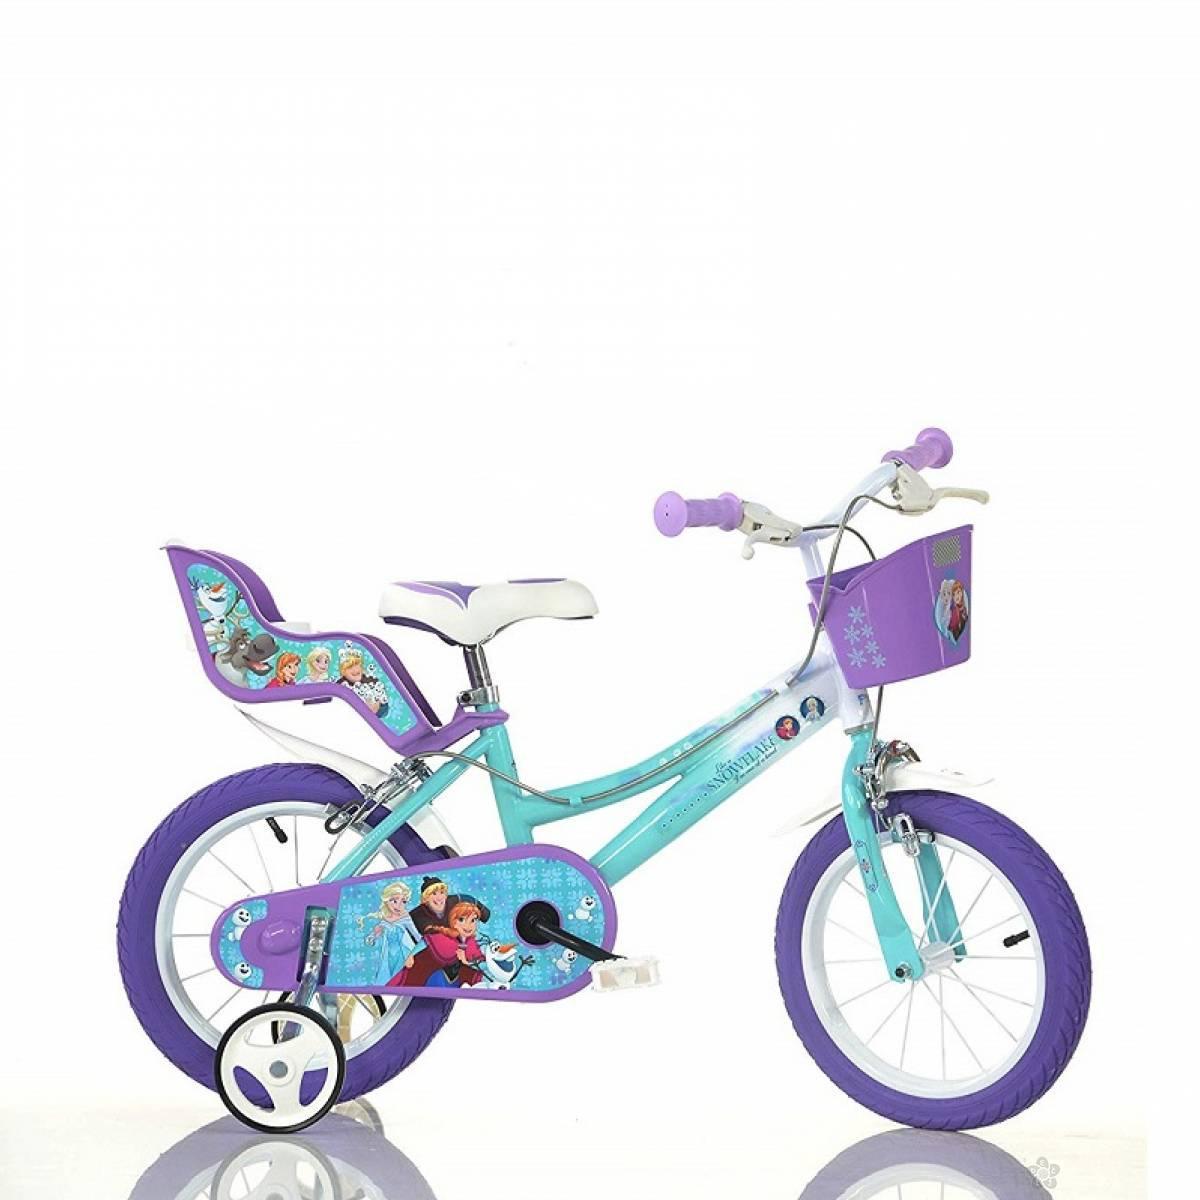 Dečiji Bicikl Snow Princess model 716-12 LJUBIČASTI